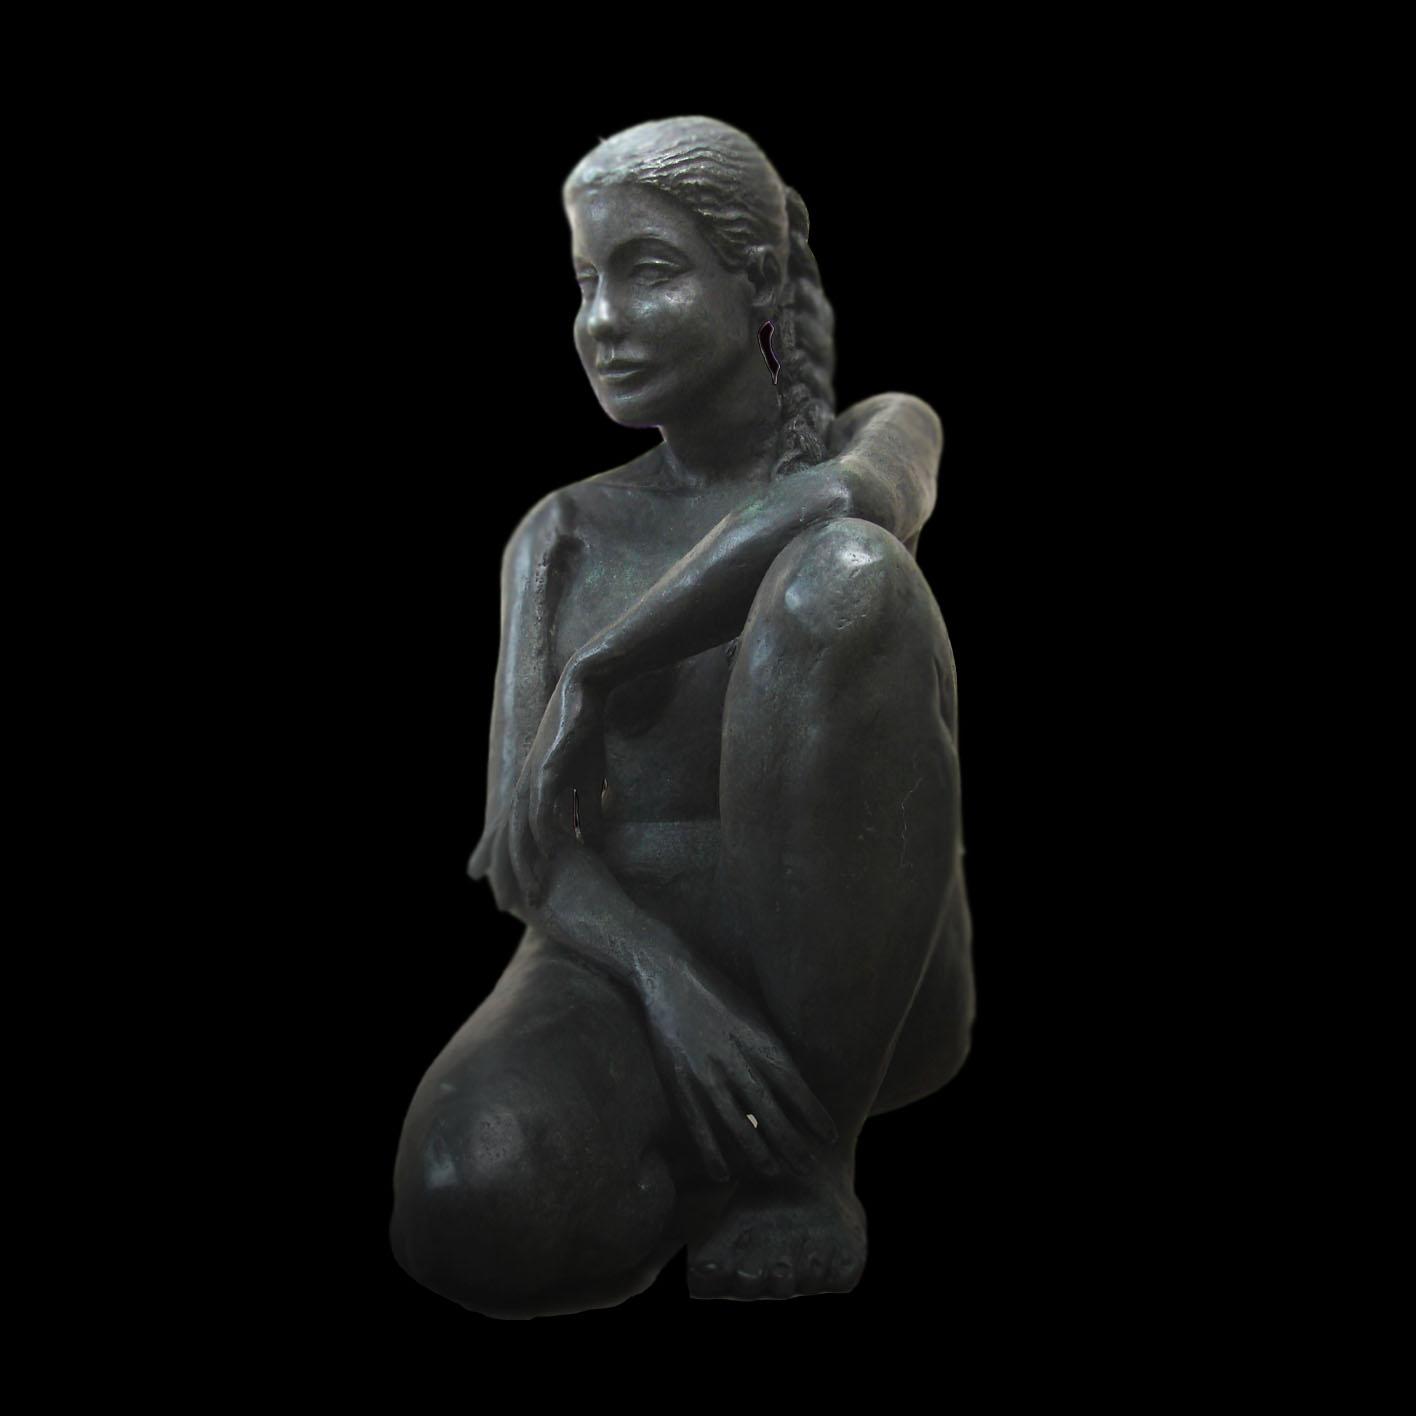 Titel: Stéphanie sur un genou, Kunstenaar: Alfred Blondel